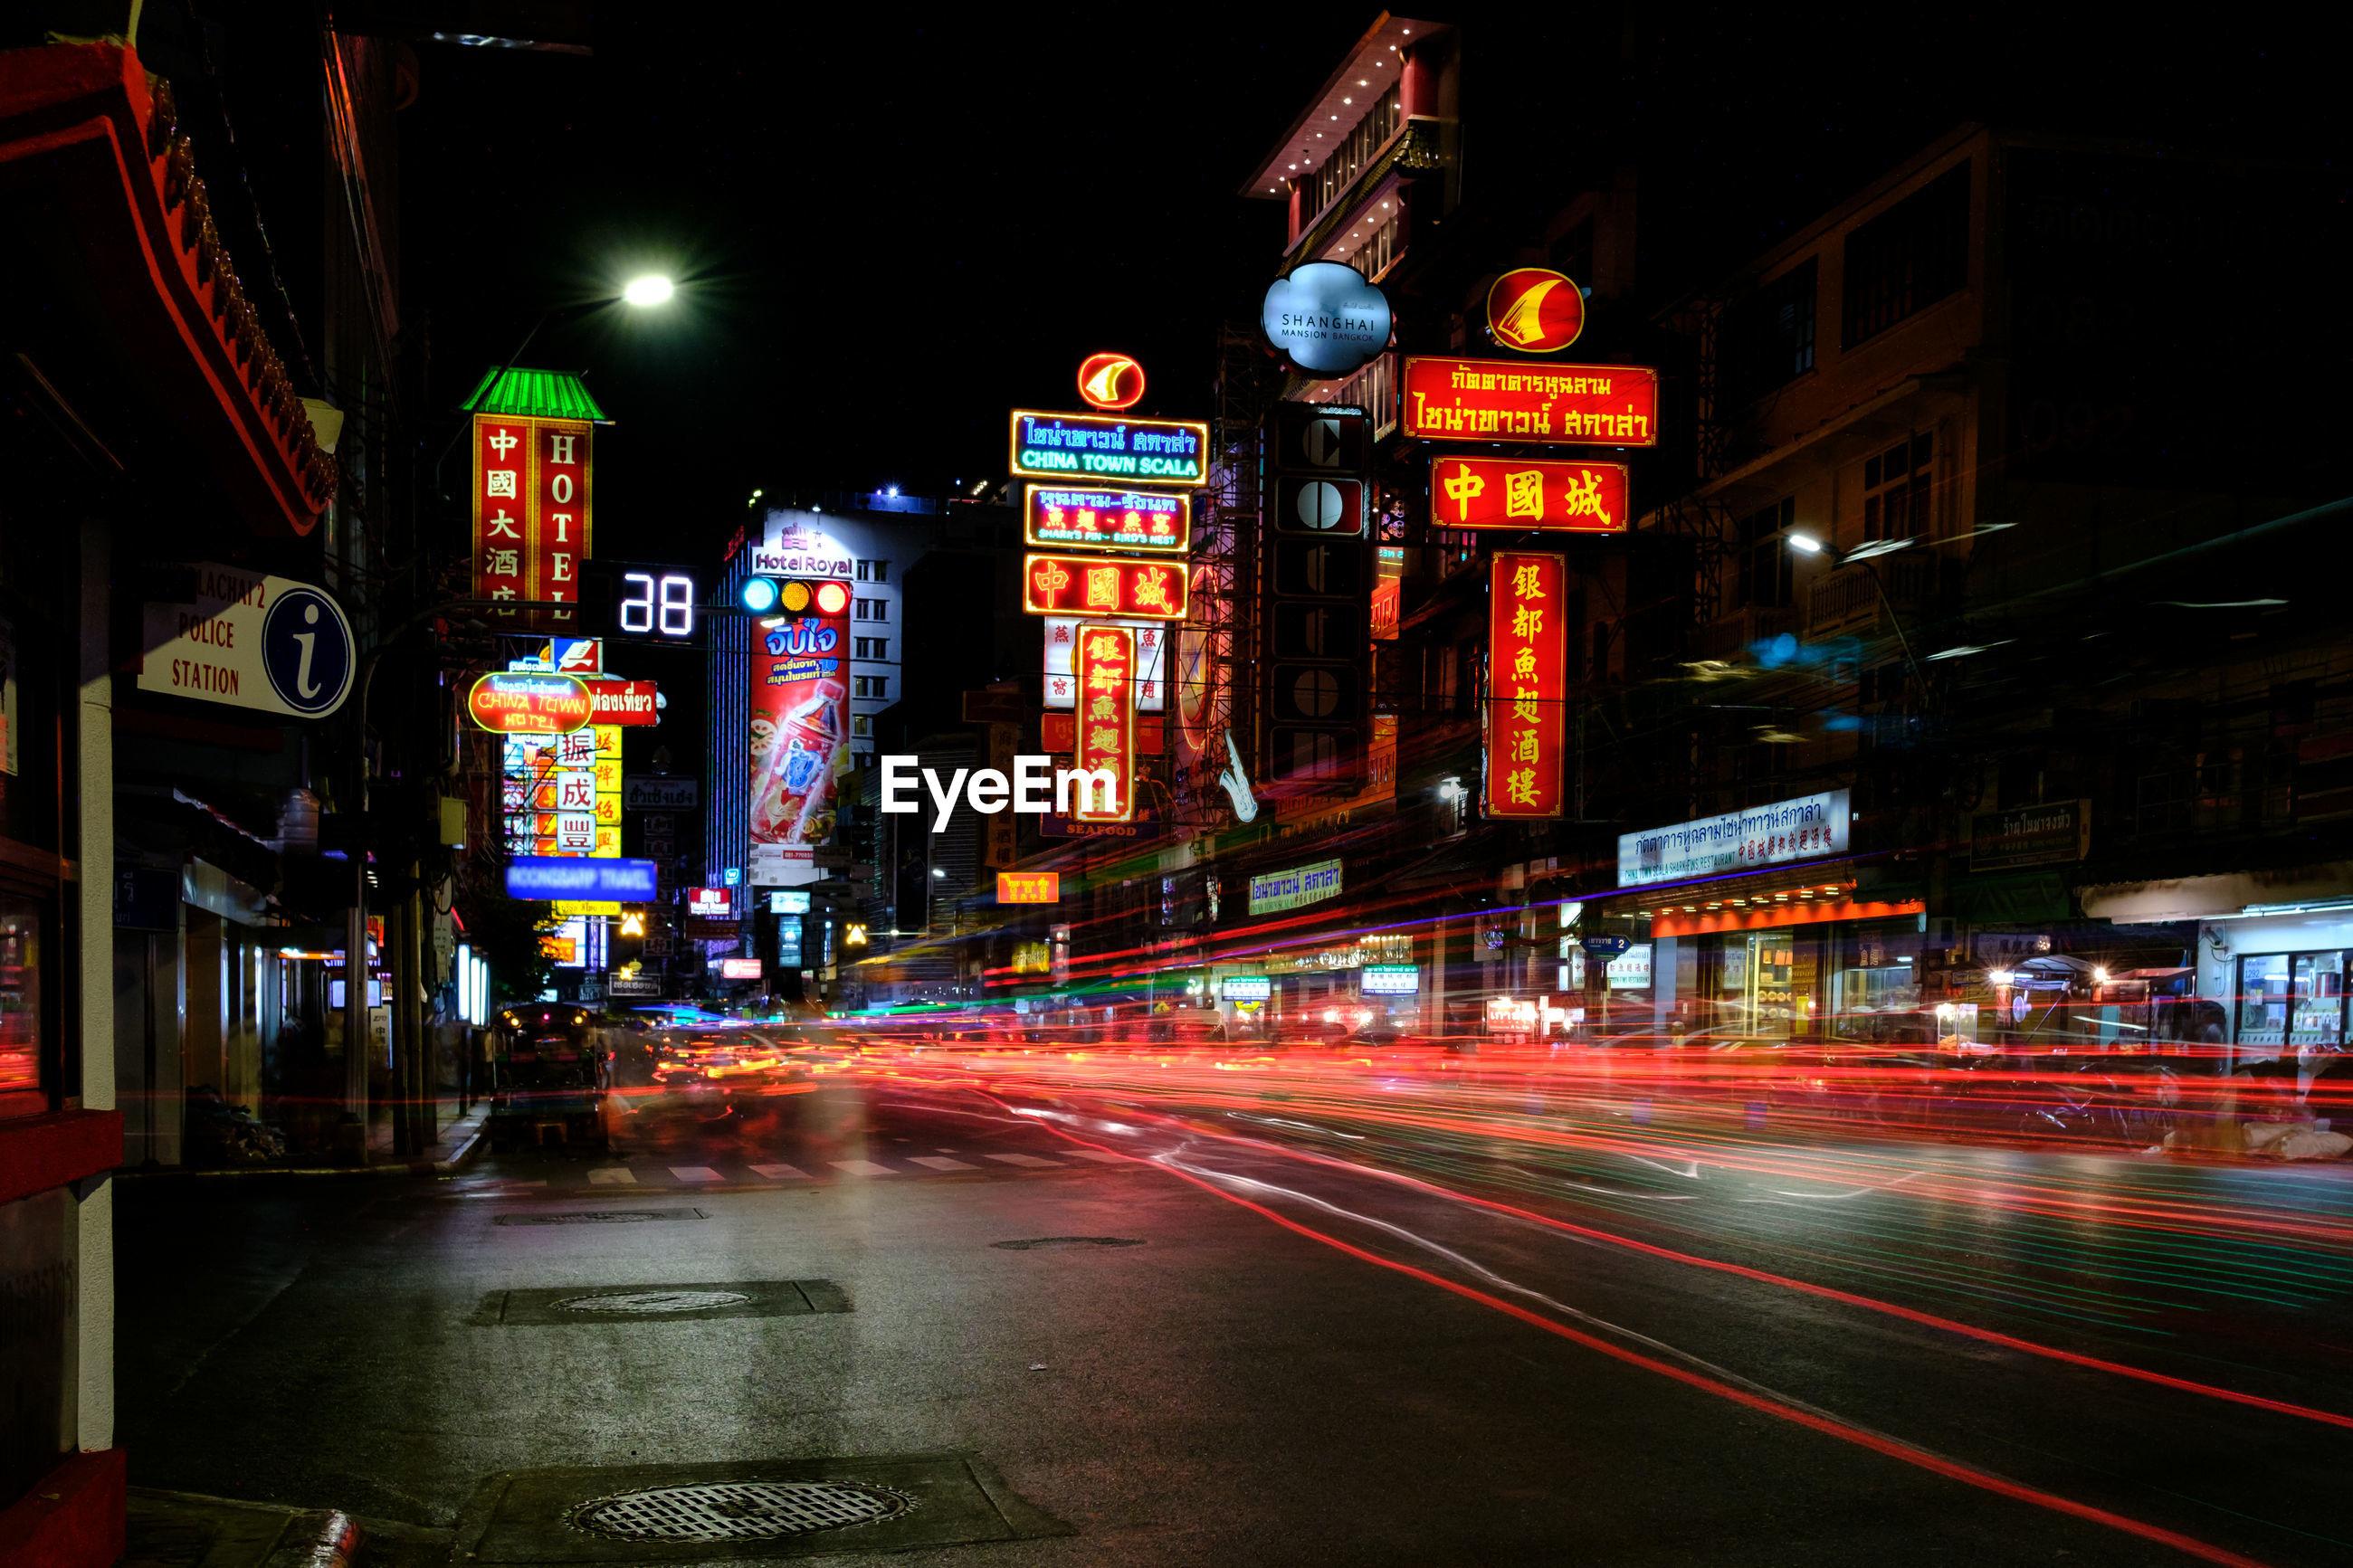 LIGHT TRAILS ON CITY STREET AGAINST ILLUMINATED BUILDINGS AT NIGHT